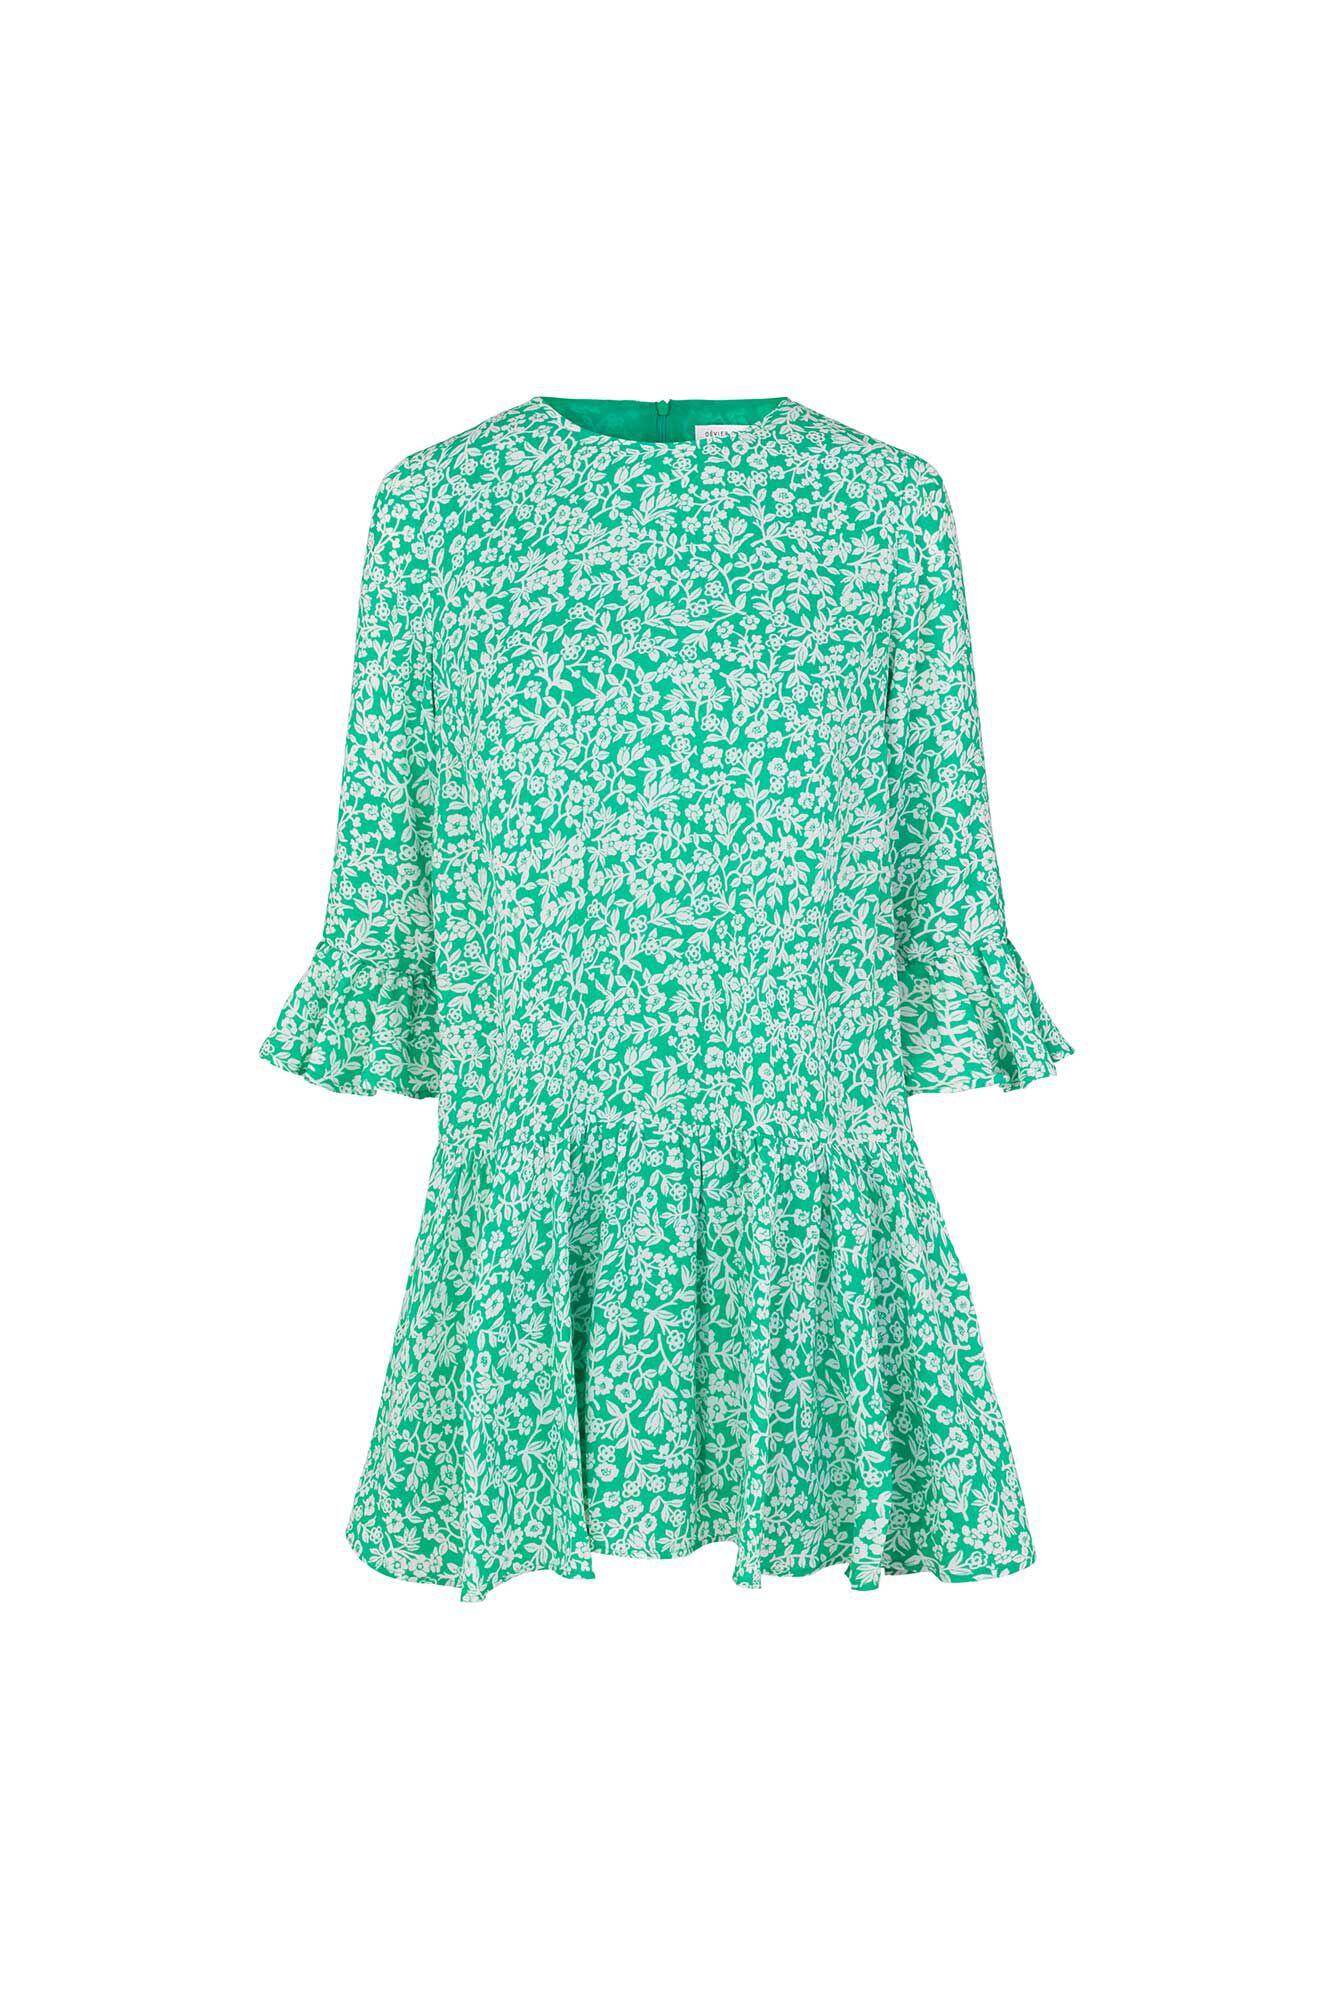 De-rose dress aop 8039